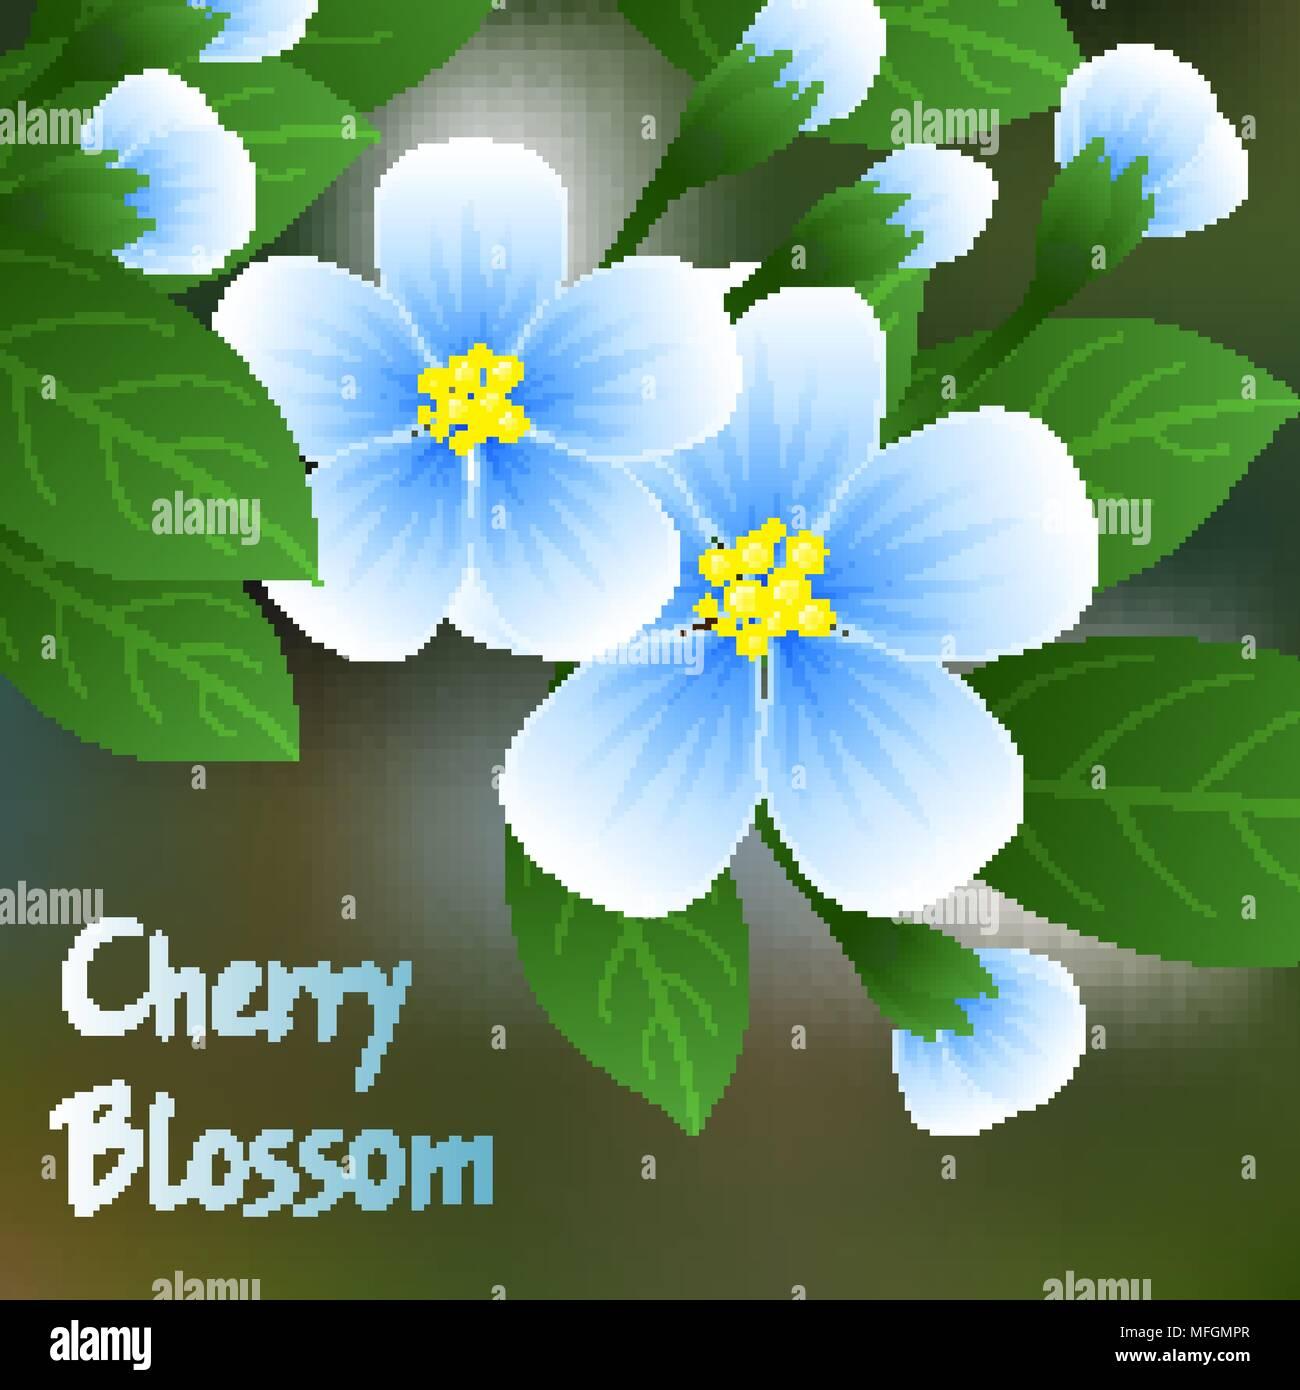 Asombroso Flores Arte De Uñas Adorno - Ideas Para Pintar Uñas - knxc ...